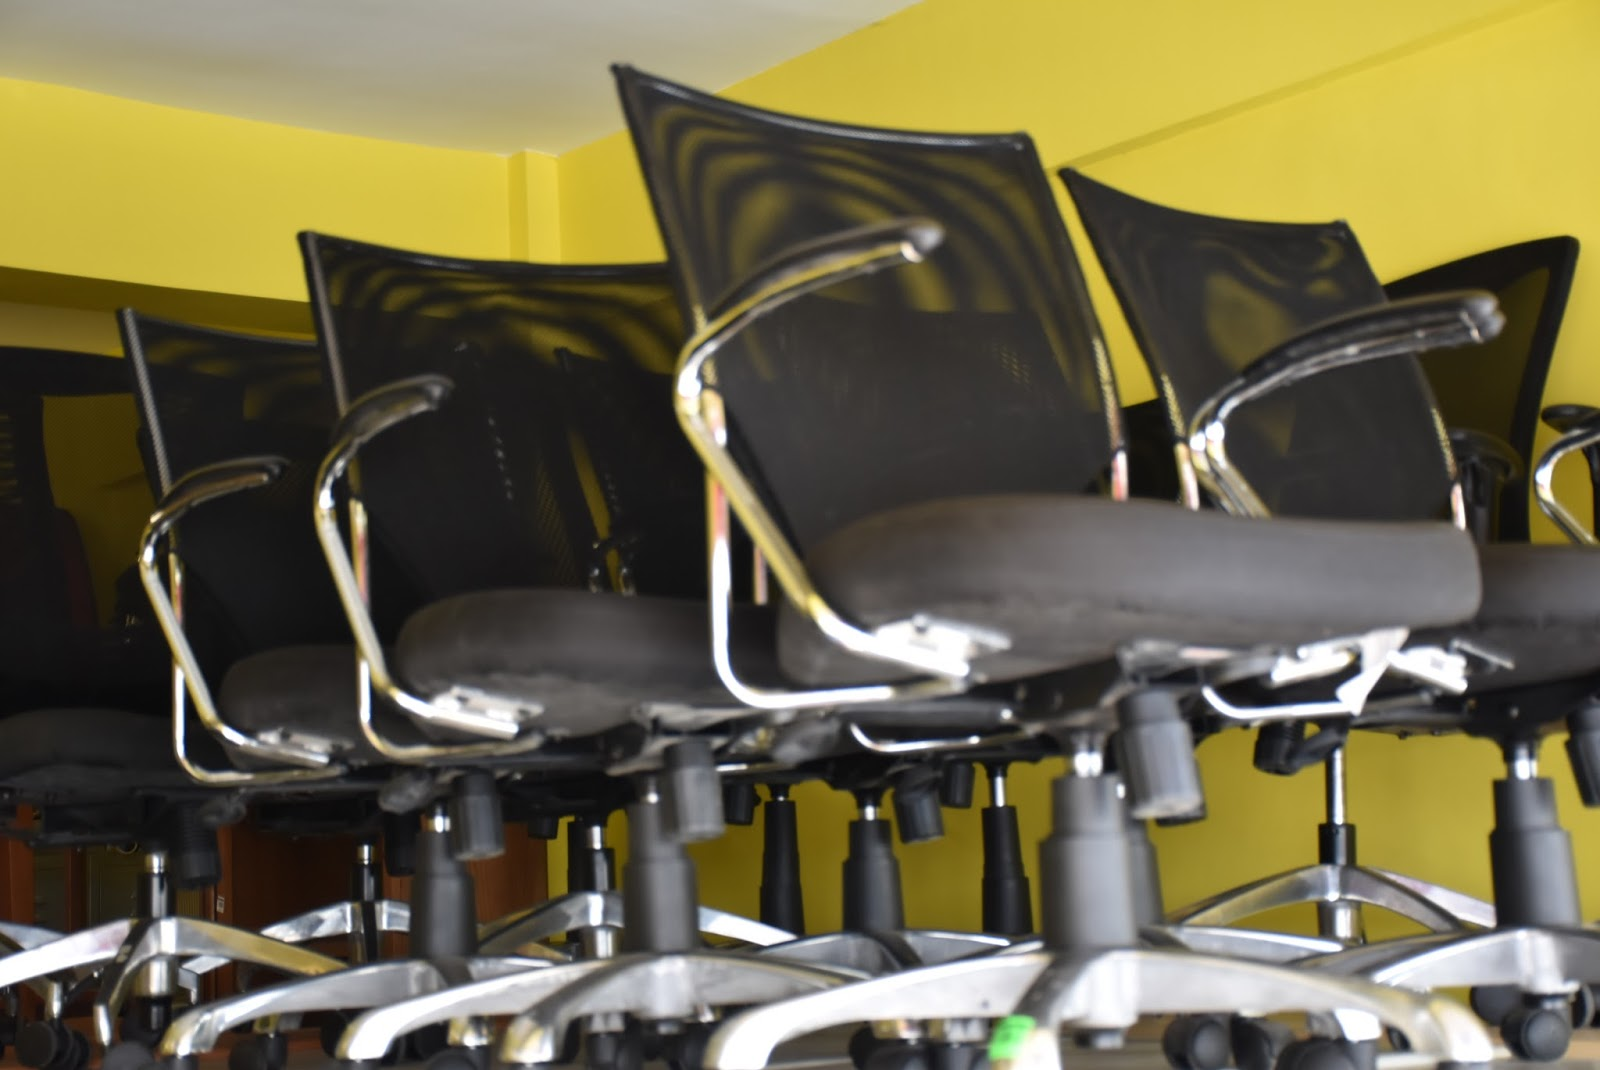 Premium Second Hand Office Furniture Supplier In Manila Megaoffice Surplus Philippines